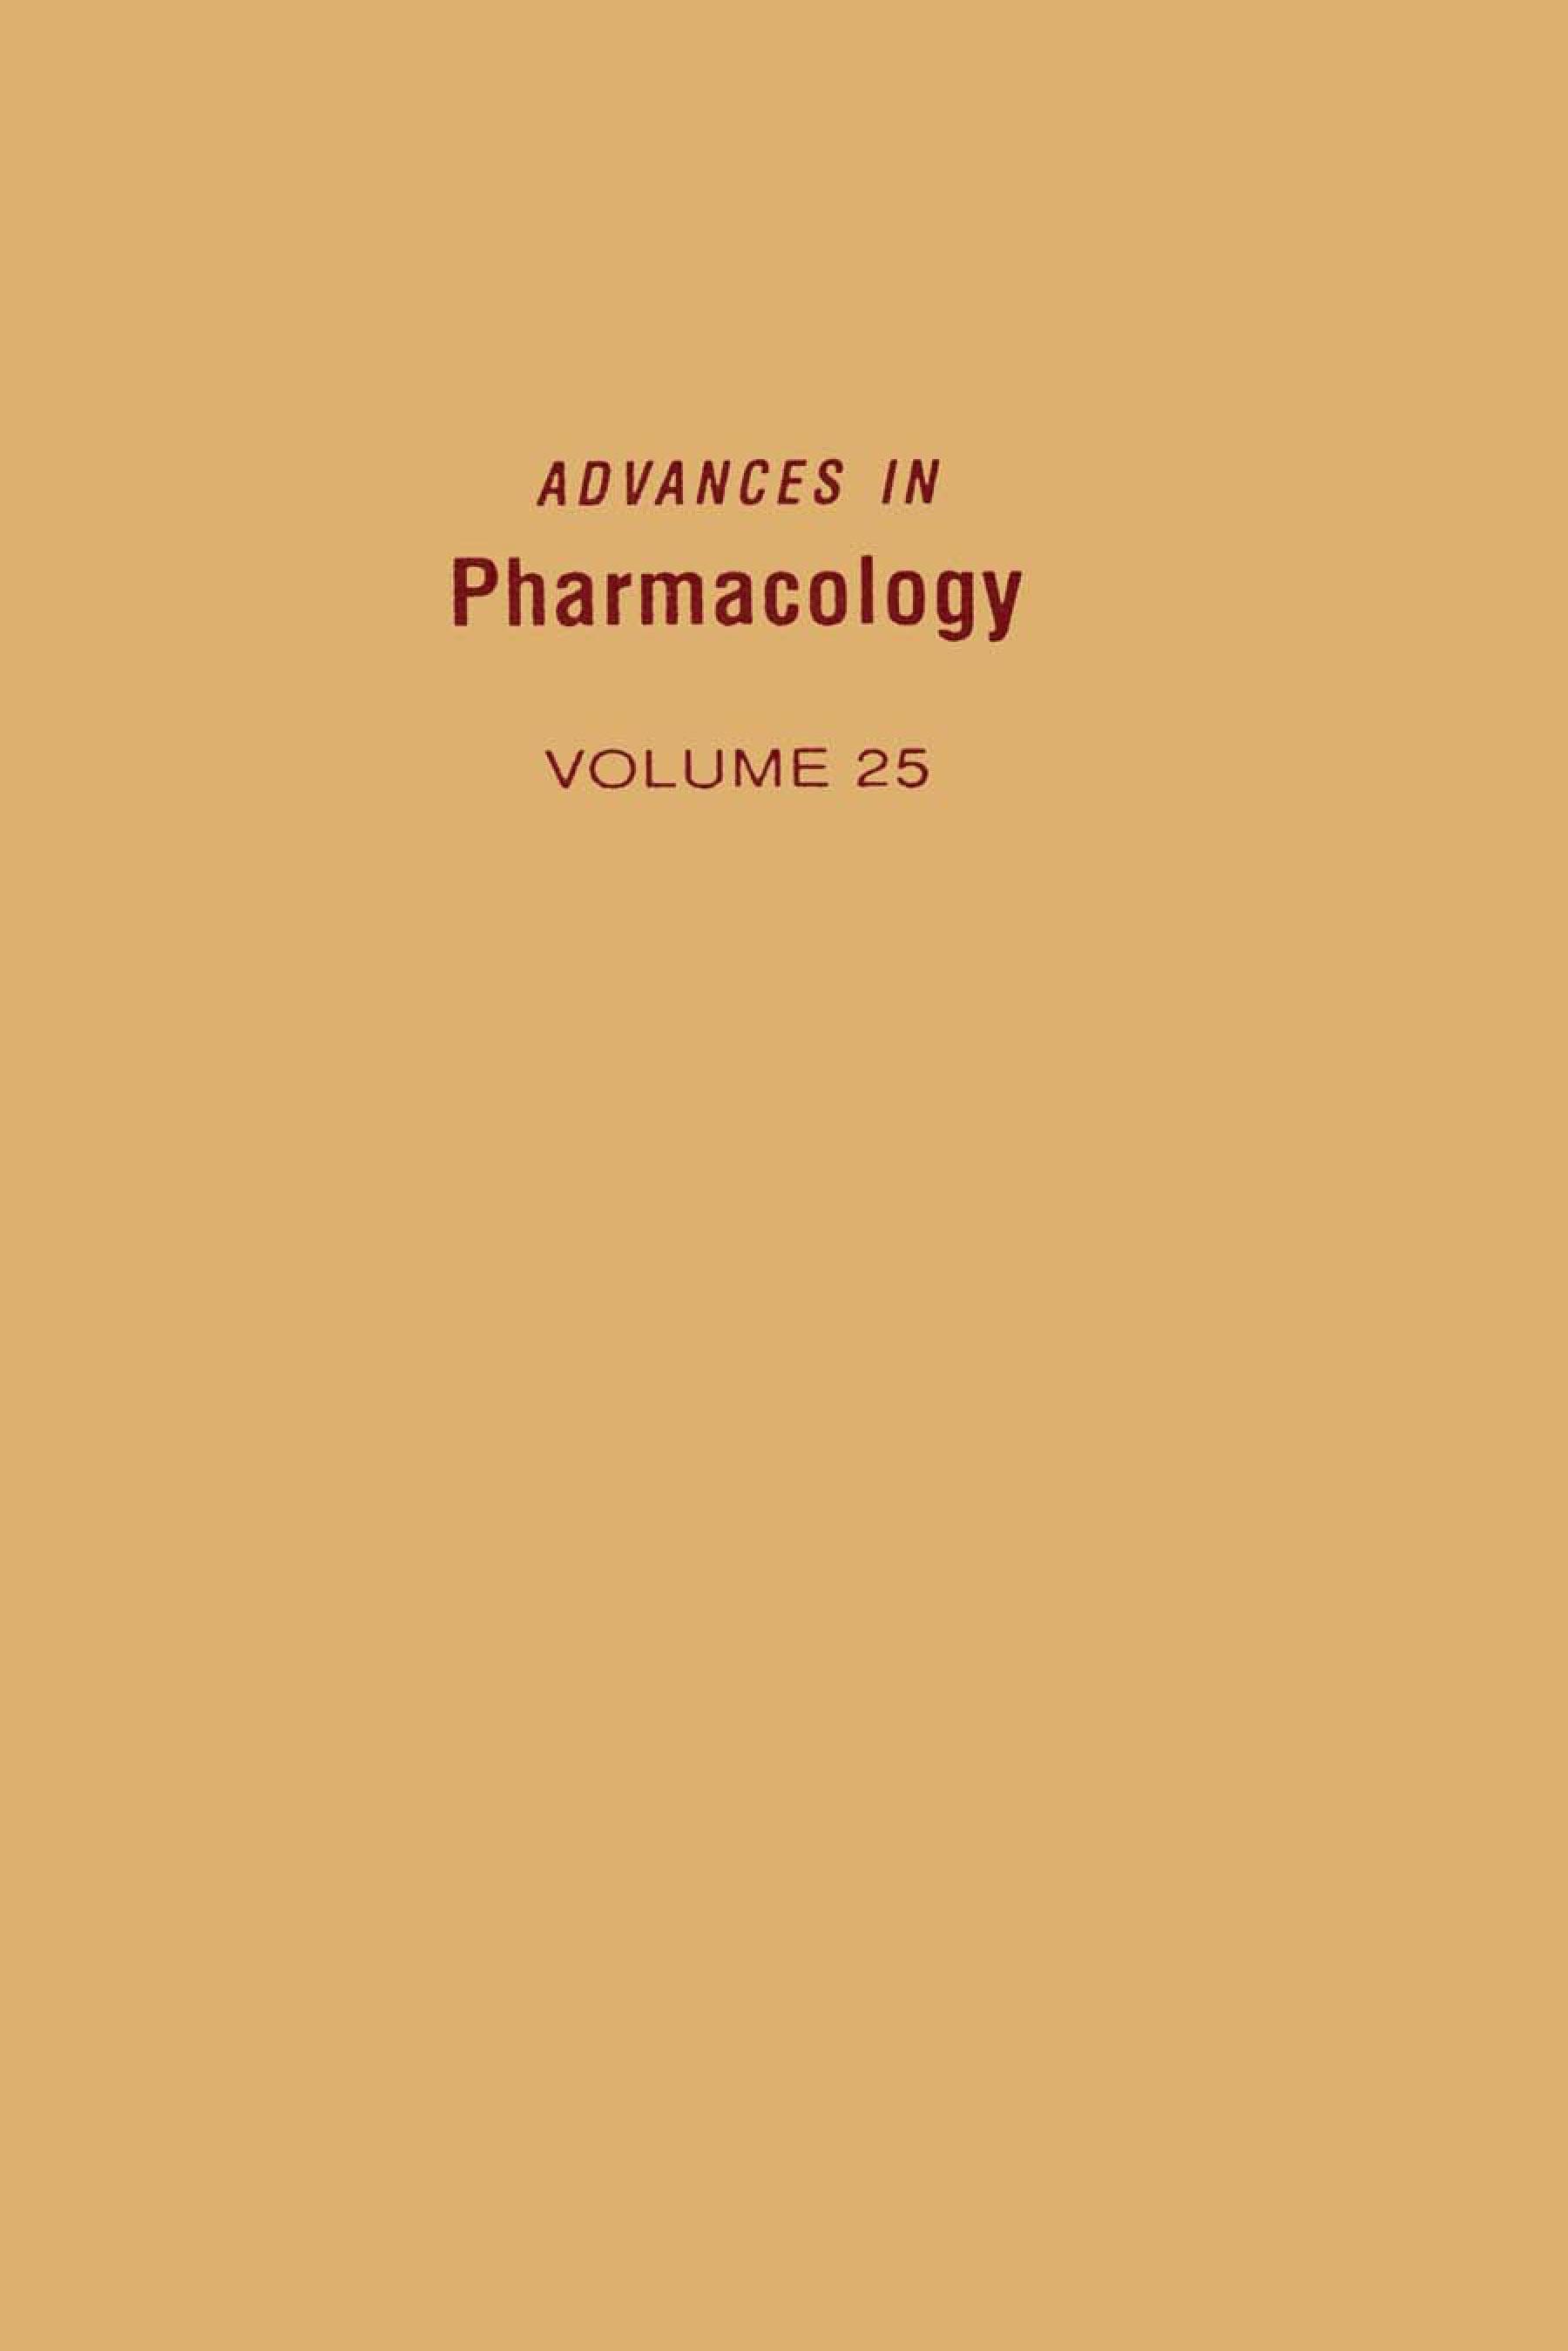 ADVANCES IN PHARMACOLOGY VOL 25 EB9780080581163